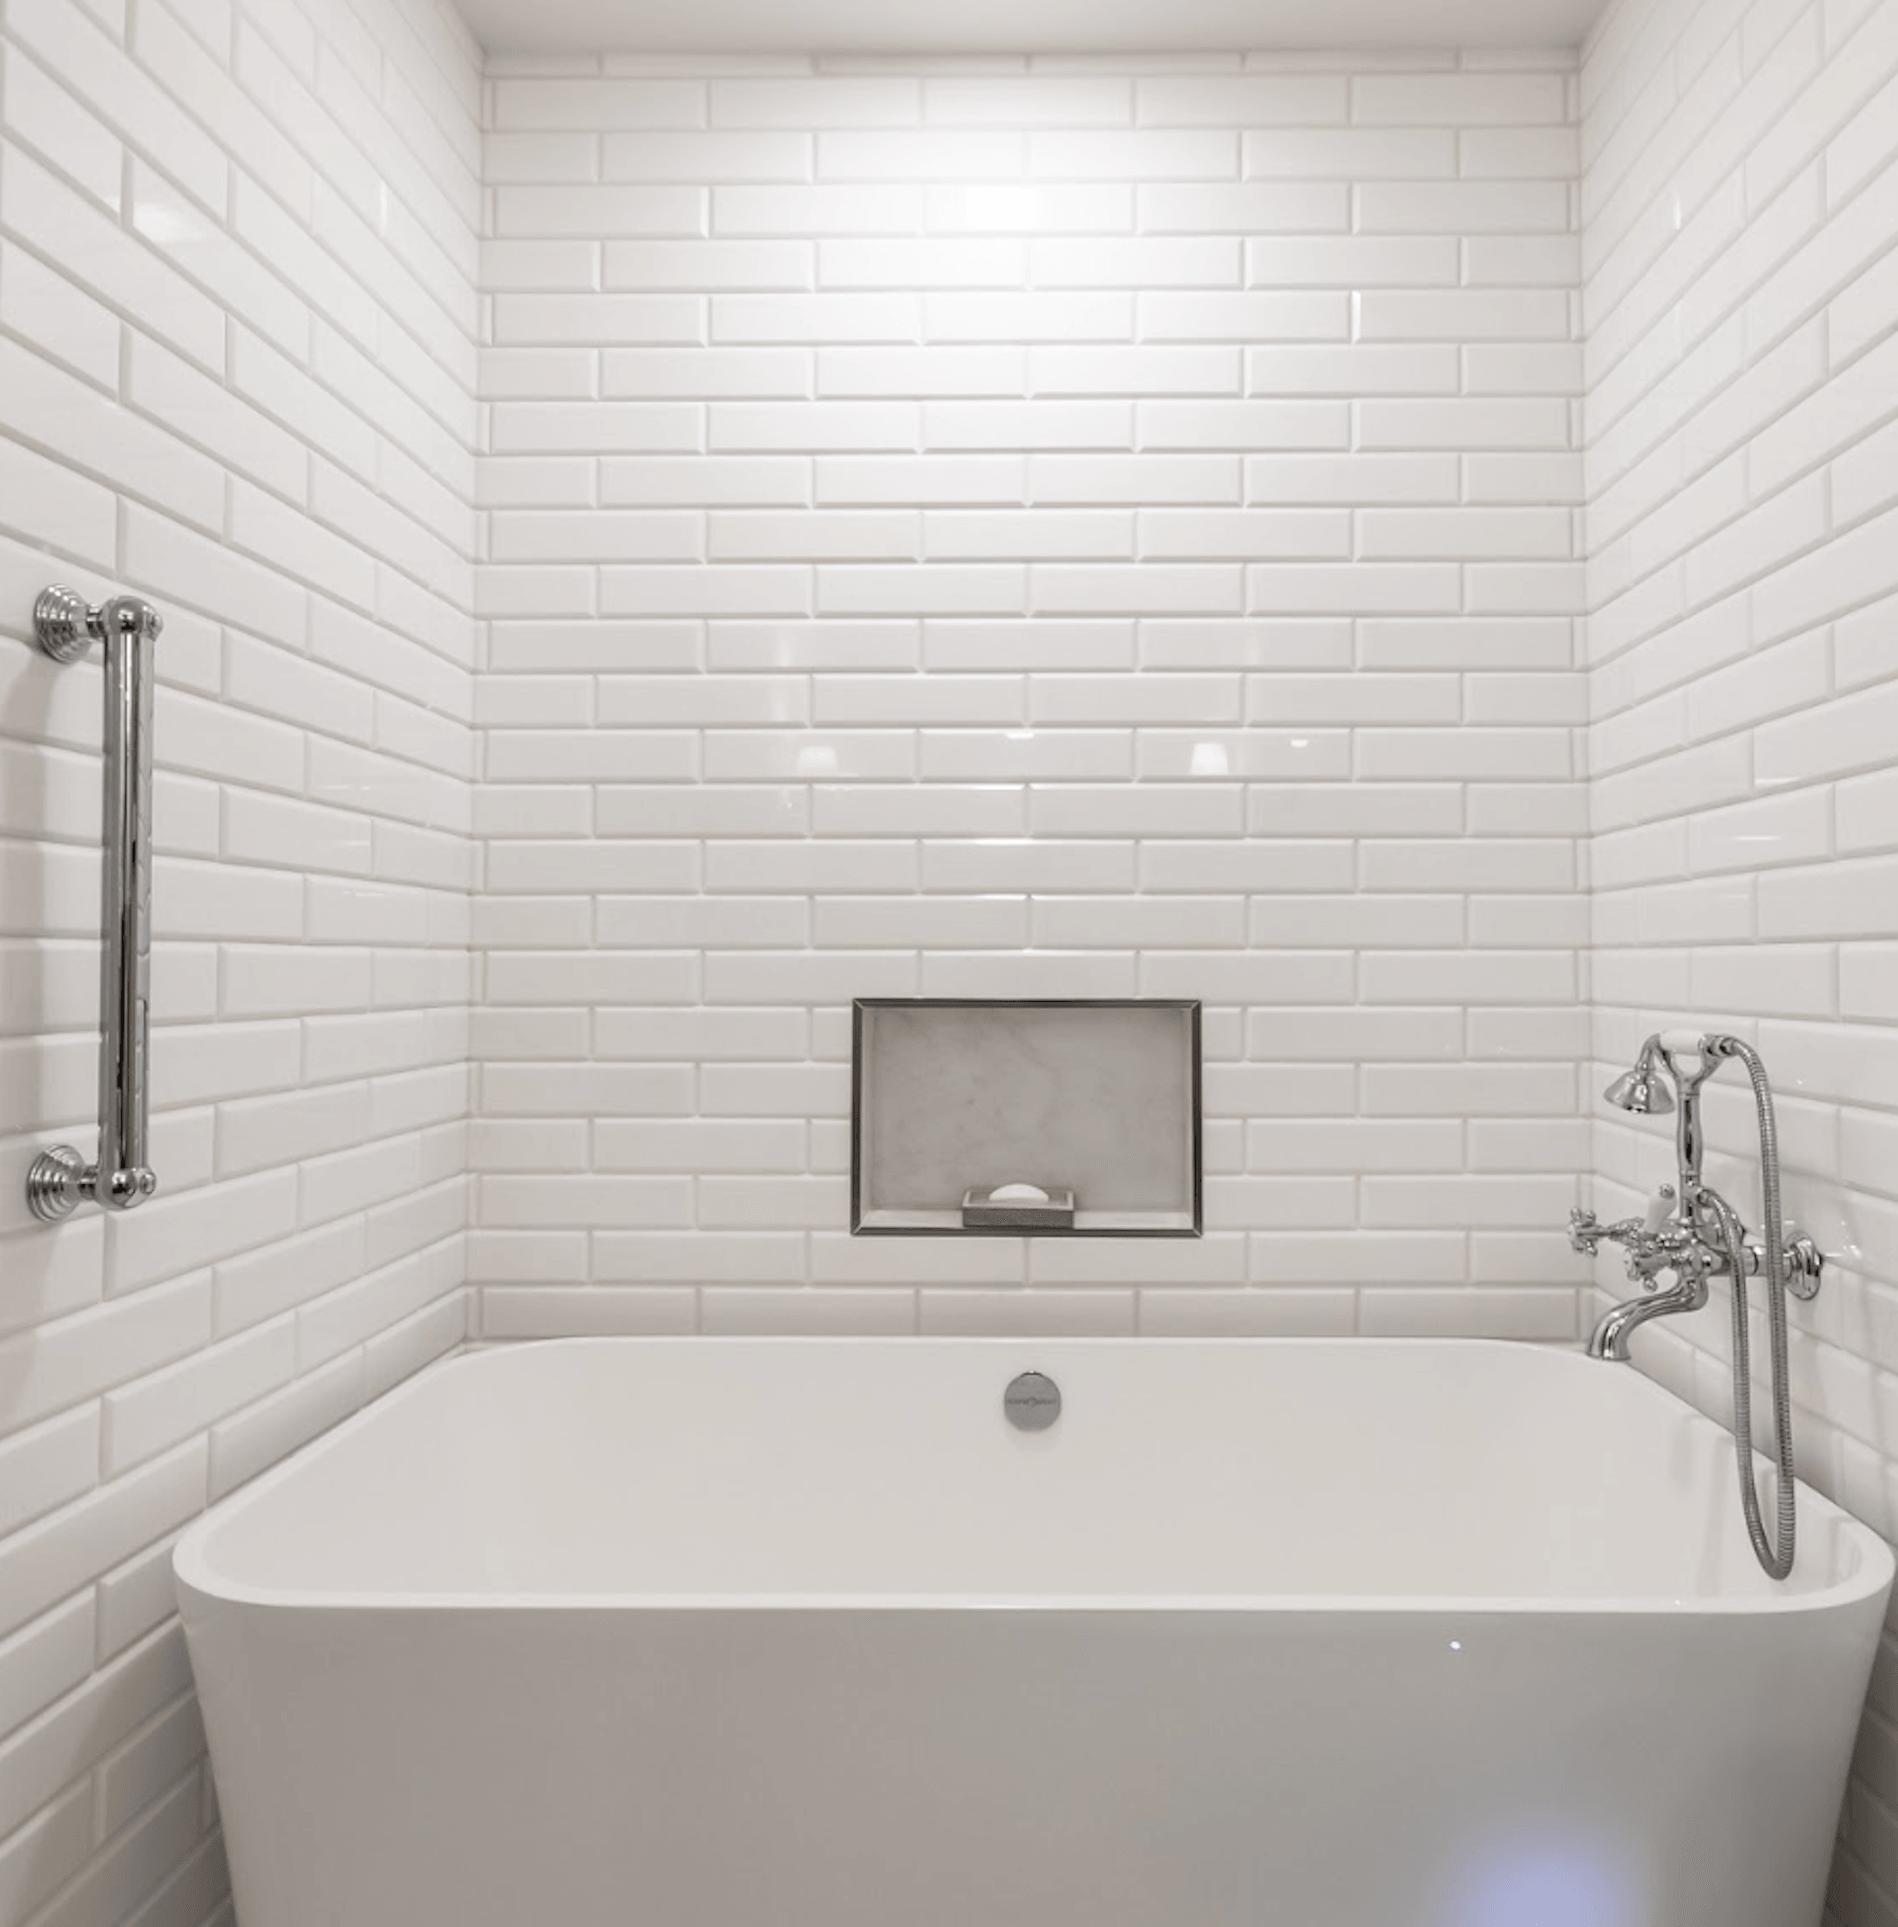 Chicago Project | Matte & Gloss Interiors